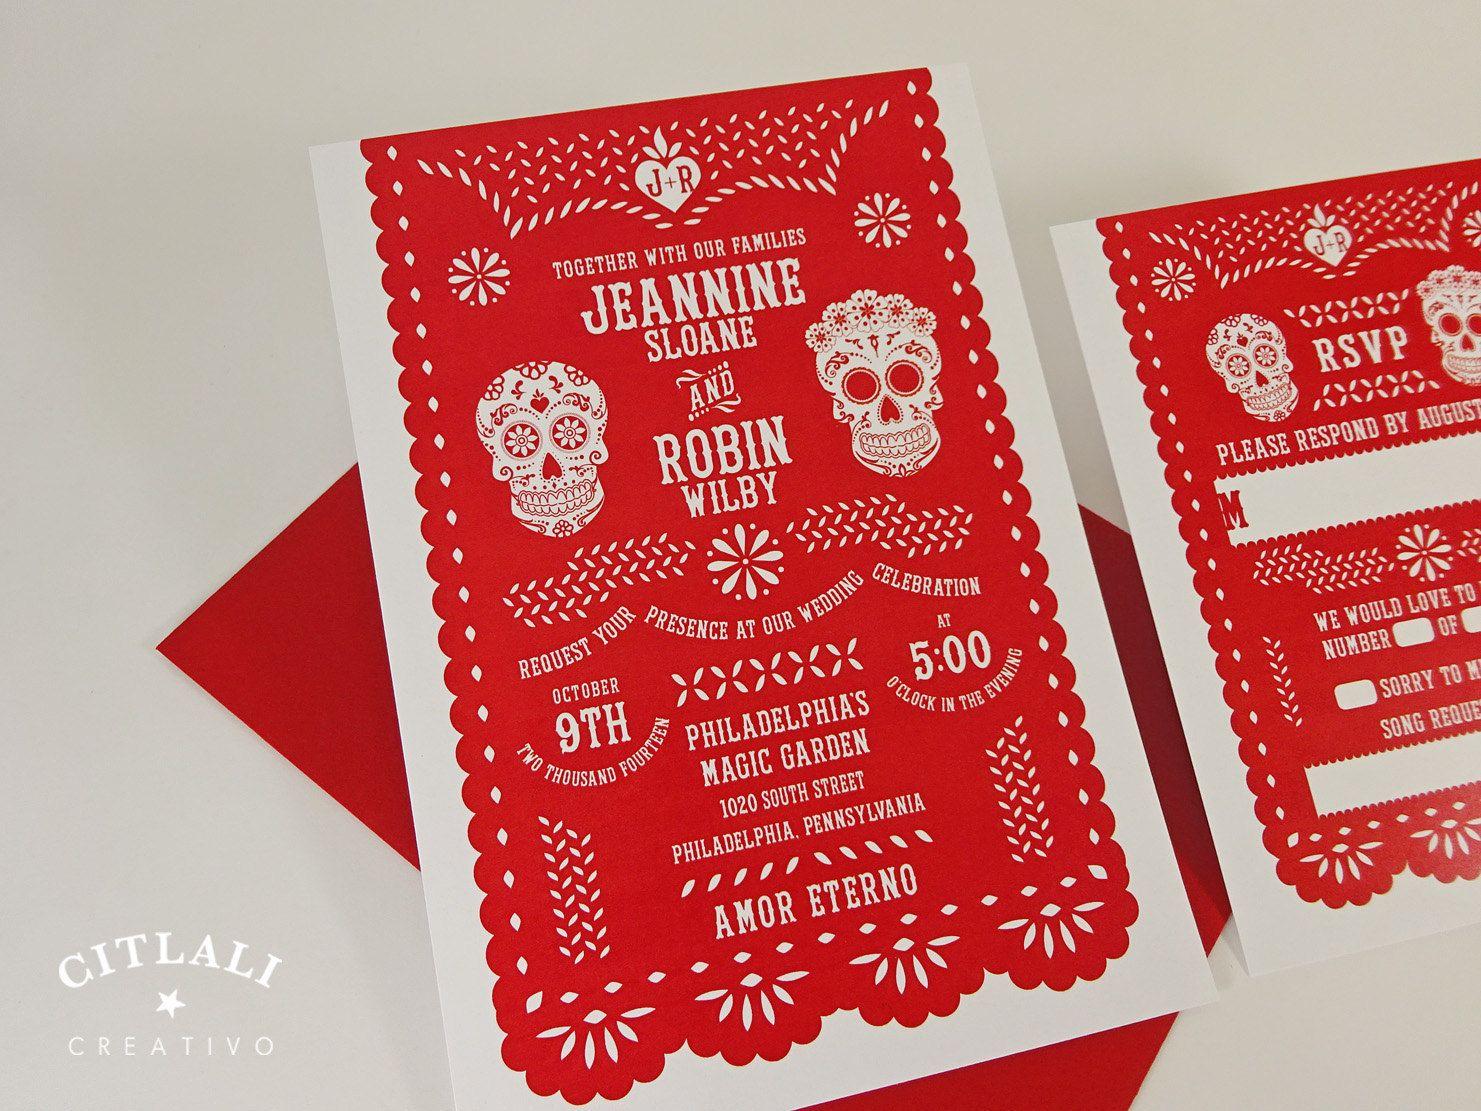 Festive Red Papel Picado & Sugar Skulls Wedding Invitations | Papel ...